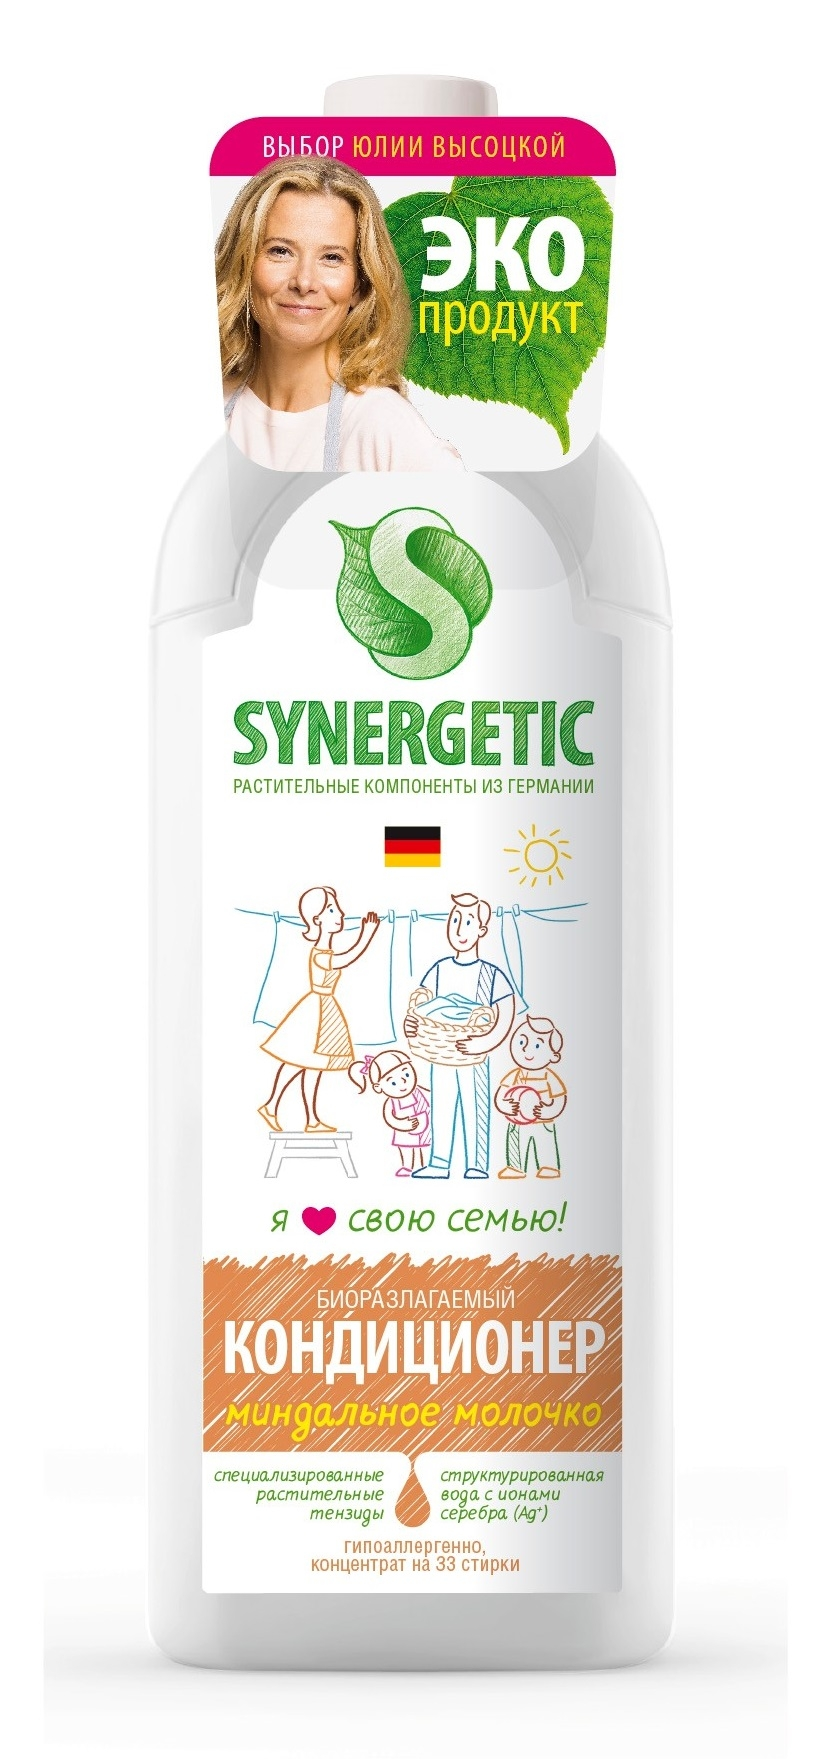 Средства для стирки Synergetic Кондиционер для белья Synergetic «Миндальное молочко» 1 л кондиционер для белья synergetic 5 л